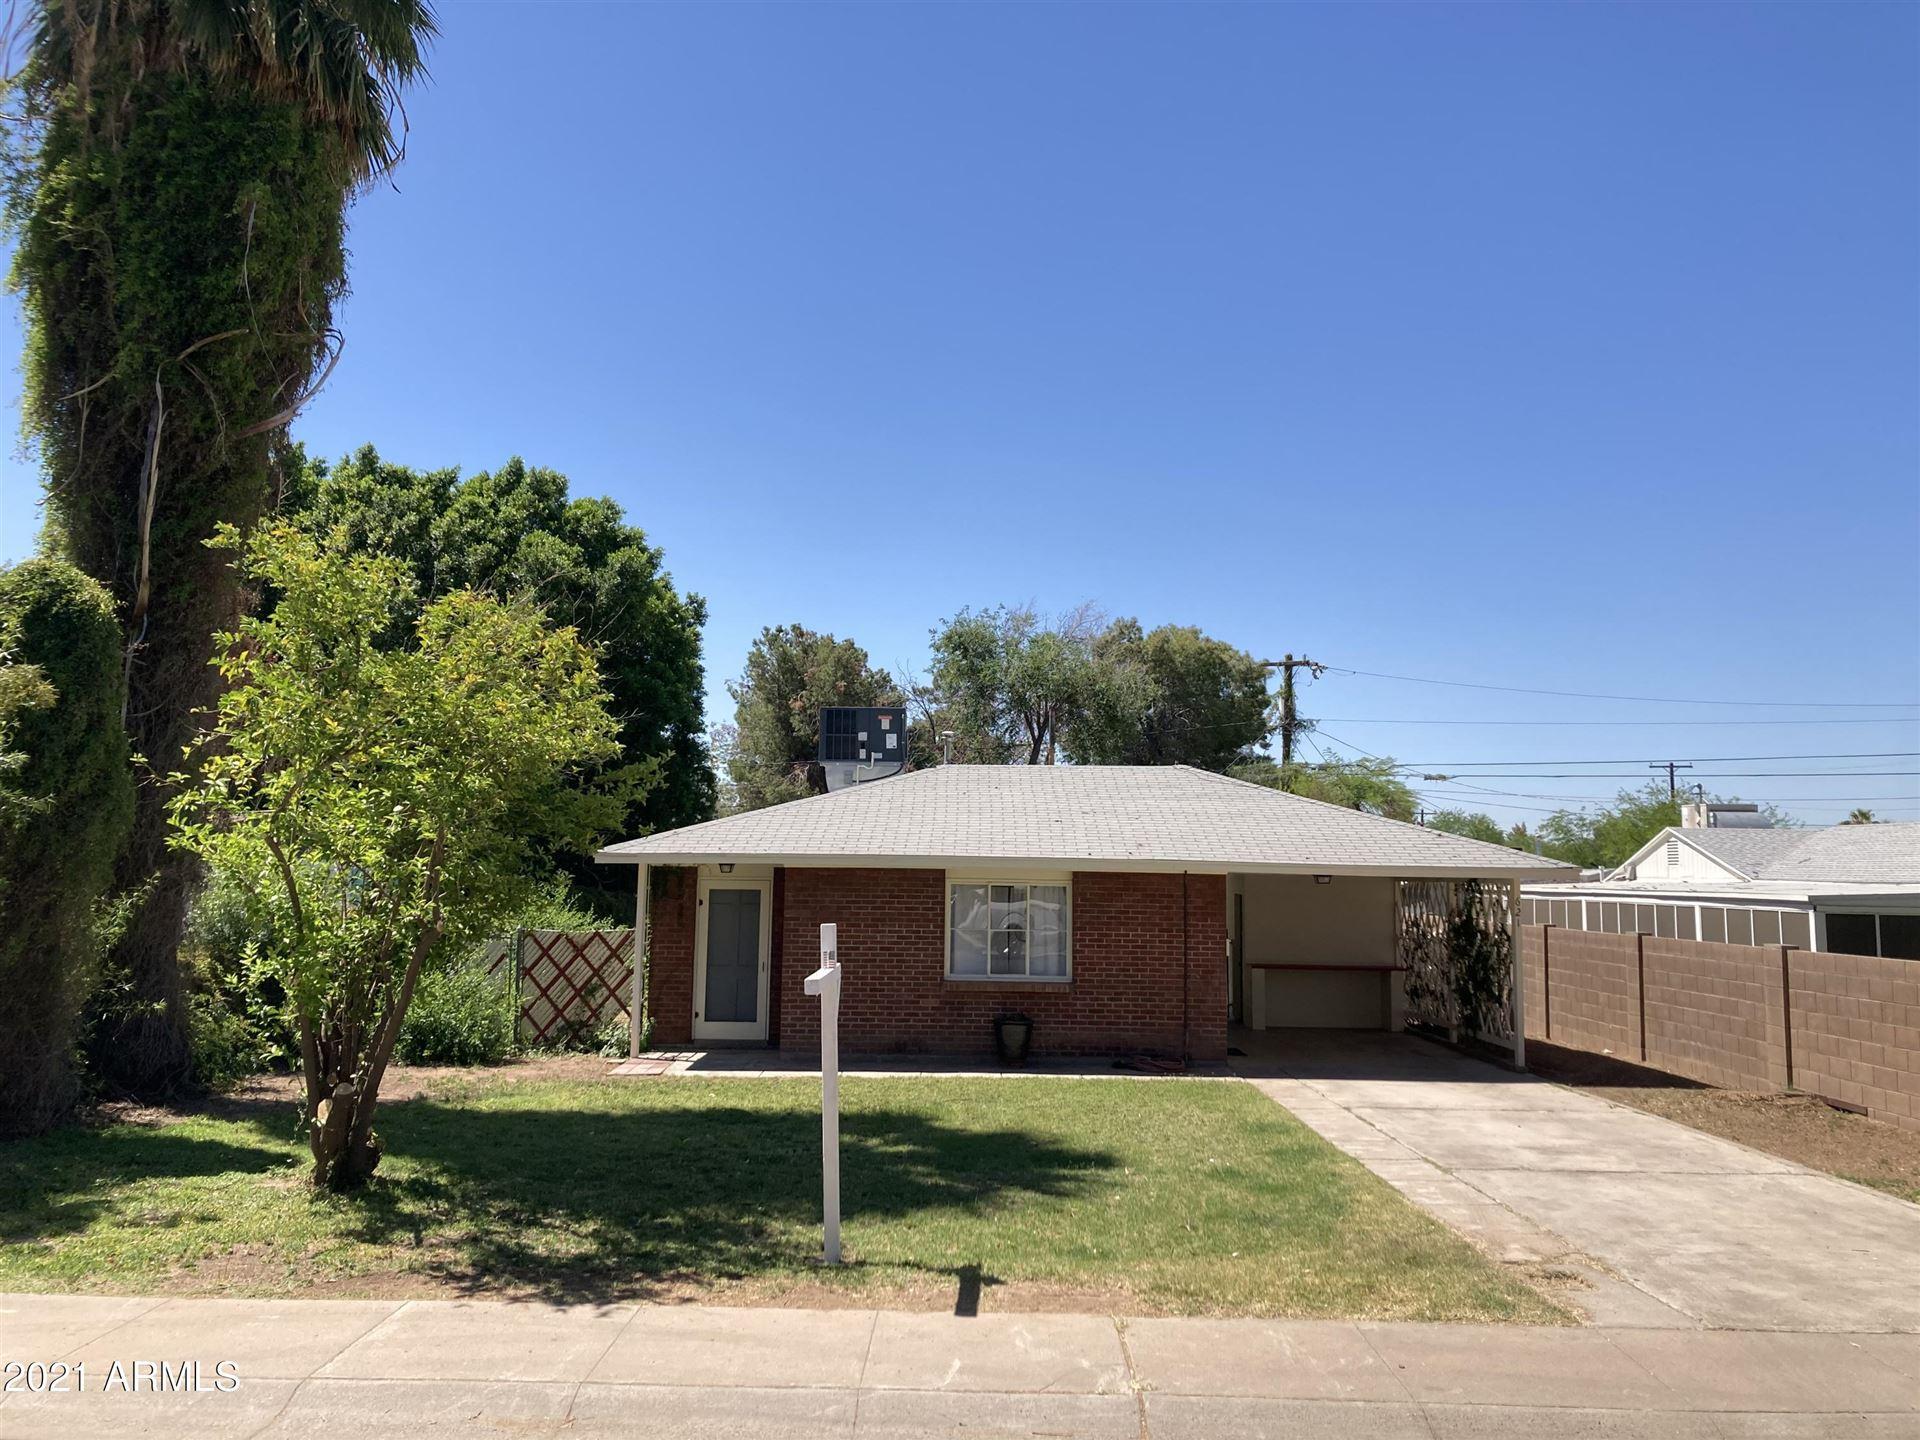 Photo of 621 W HOWE Street, Tempe, AZ 85281 (MLS # 6230863)